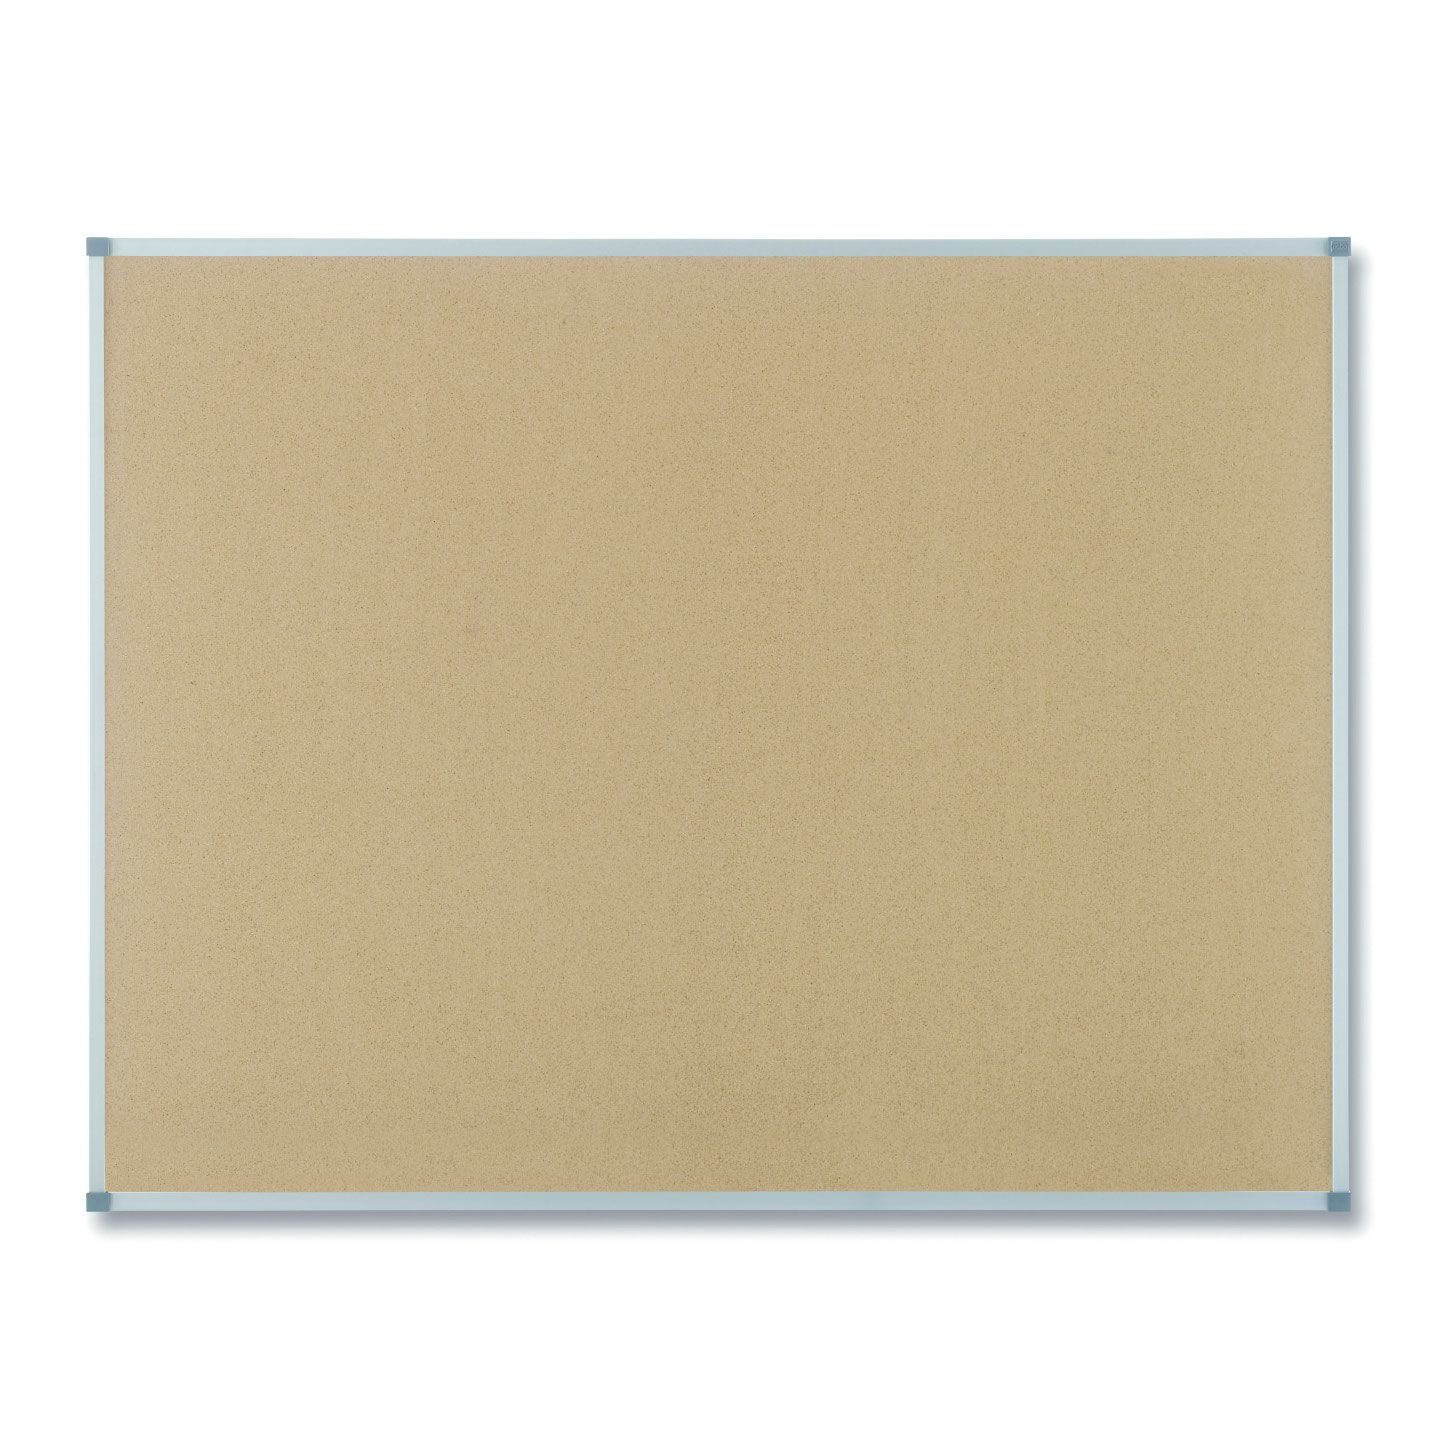 Nobo Basic Aluminium Trim Cork Noticeboard 1800x1200mm 1904065